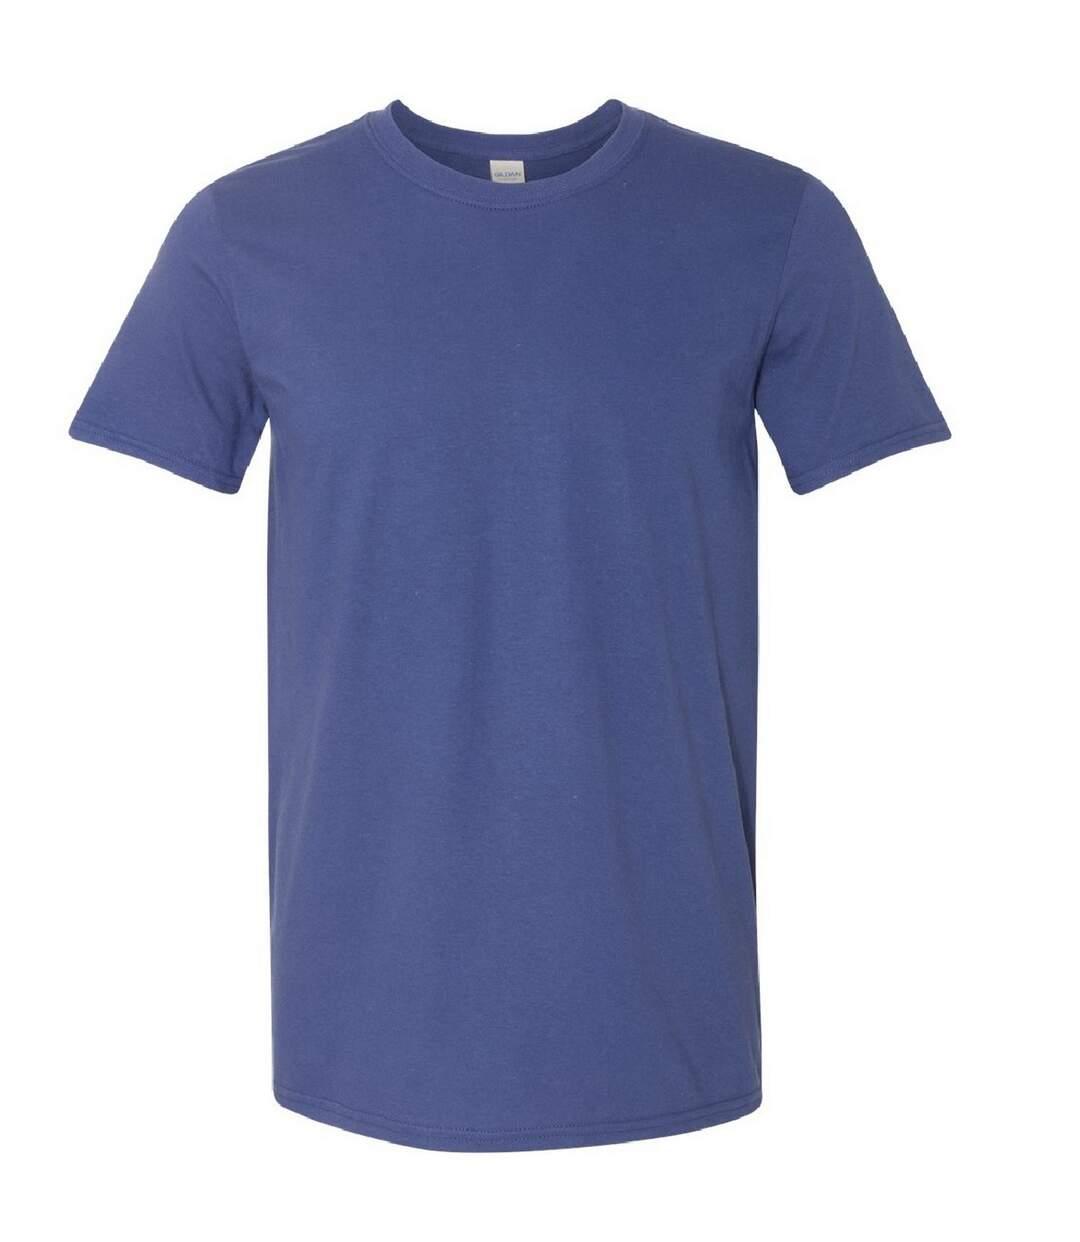 Gildan Mens Short Sleeve Soft-Style T-Shirt (Metro Blue) - UTBC484